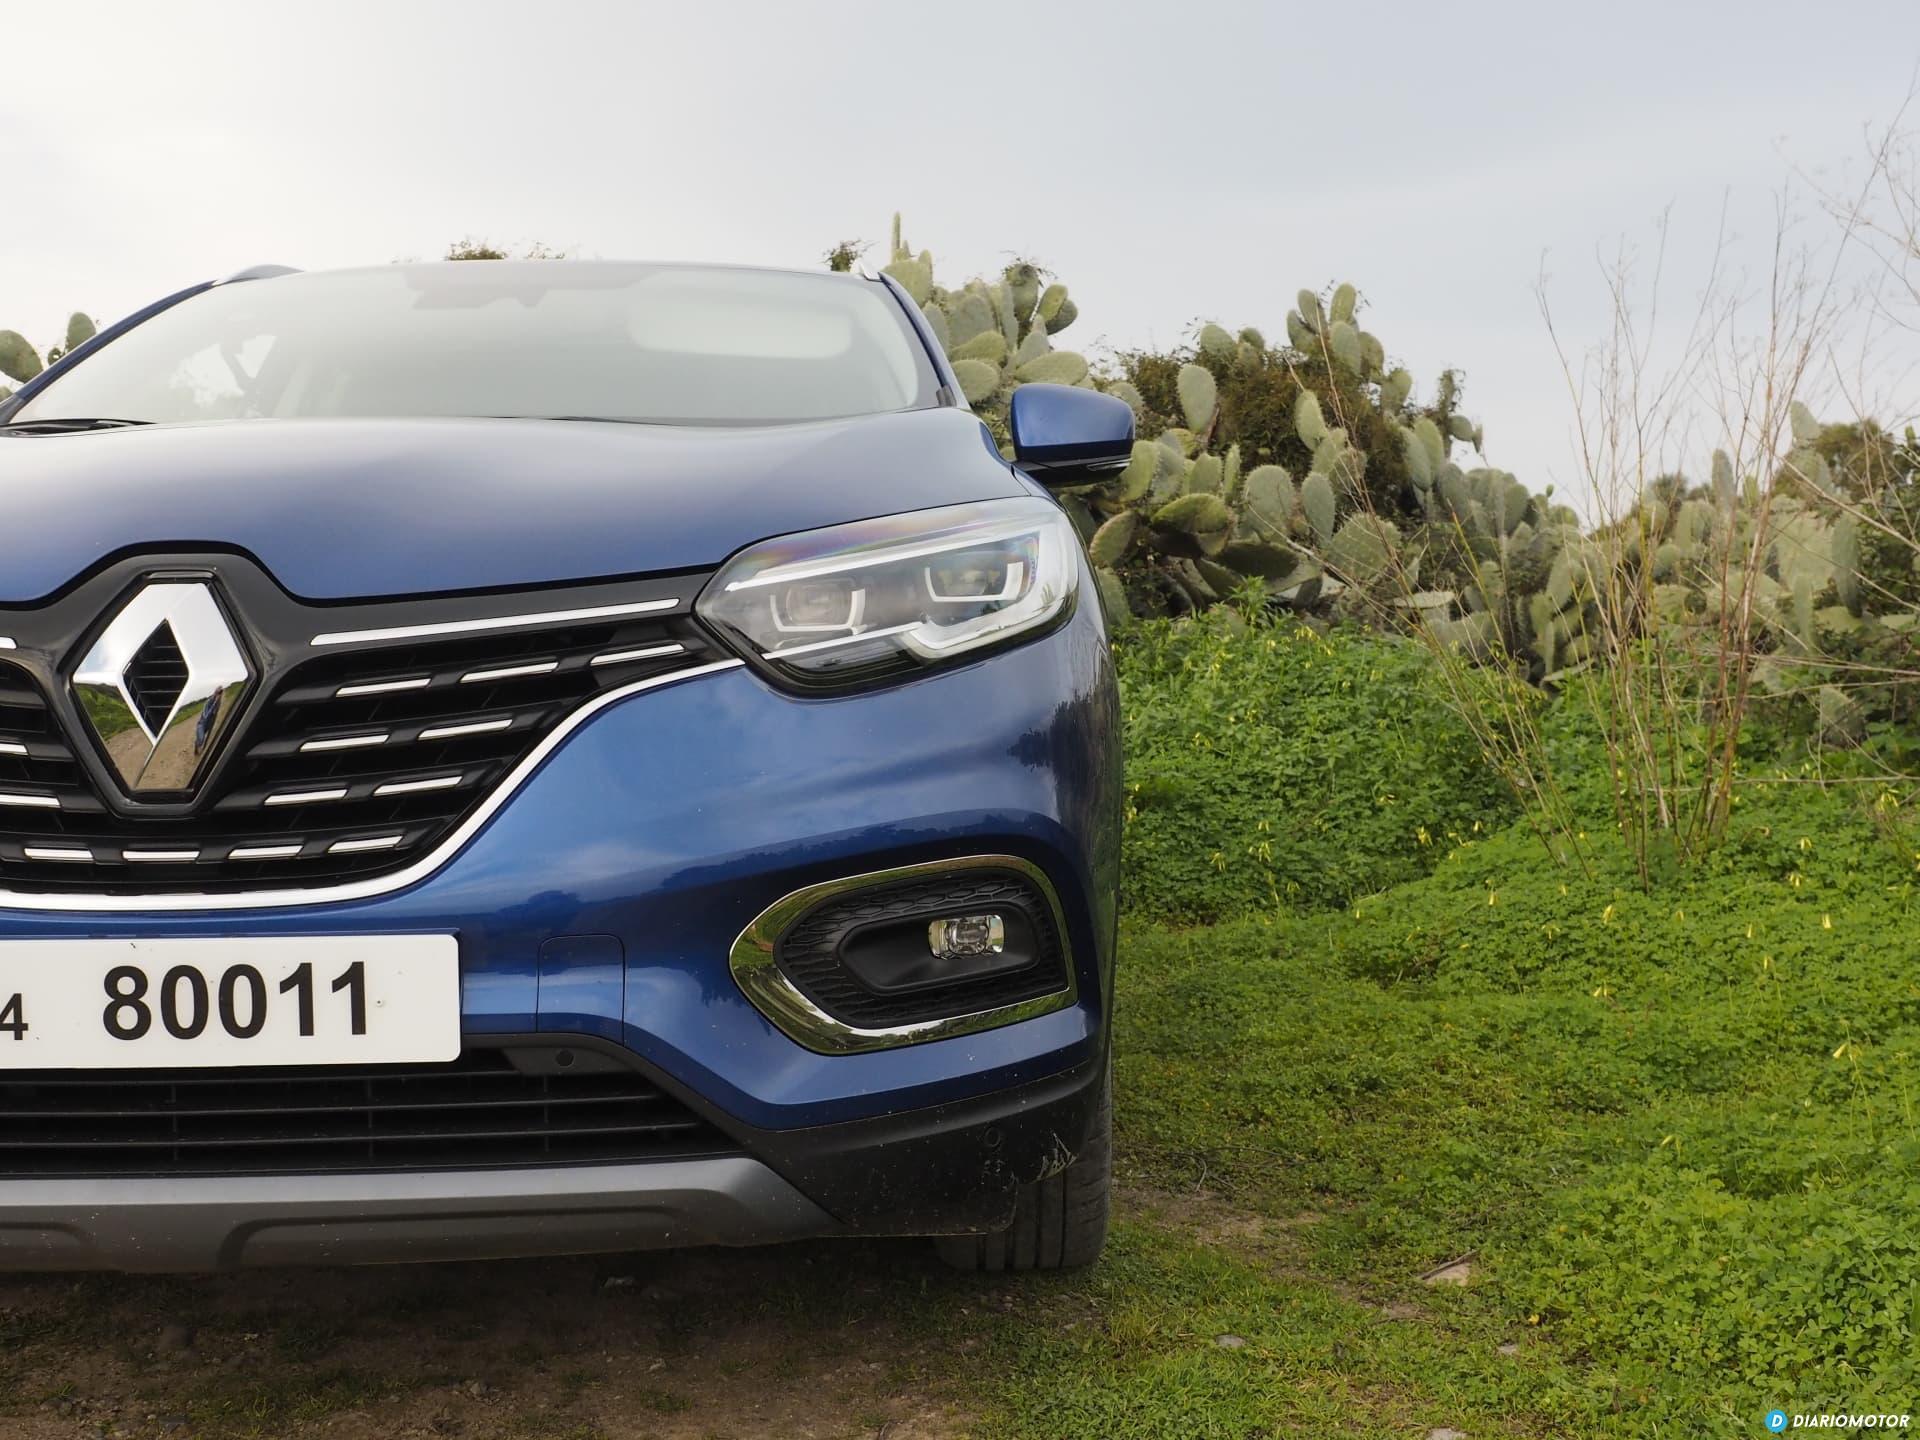 Renault Kadjar 2019 Exterior 00008